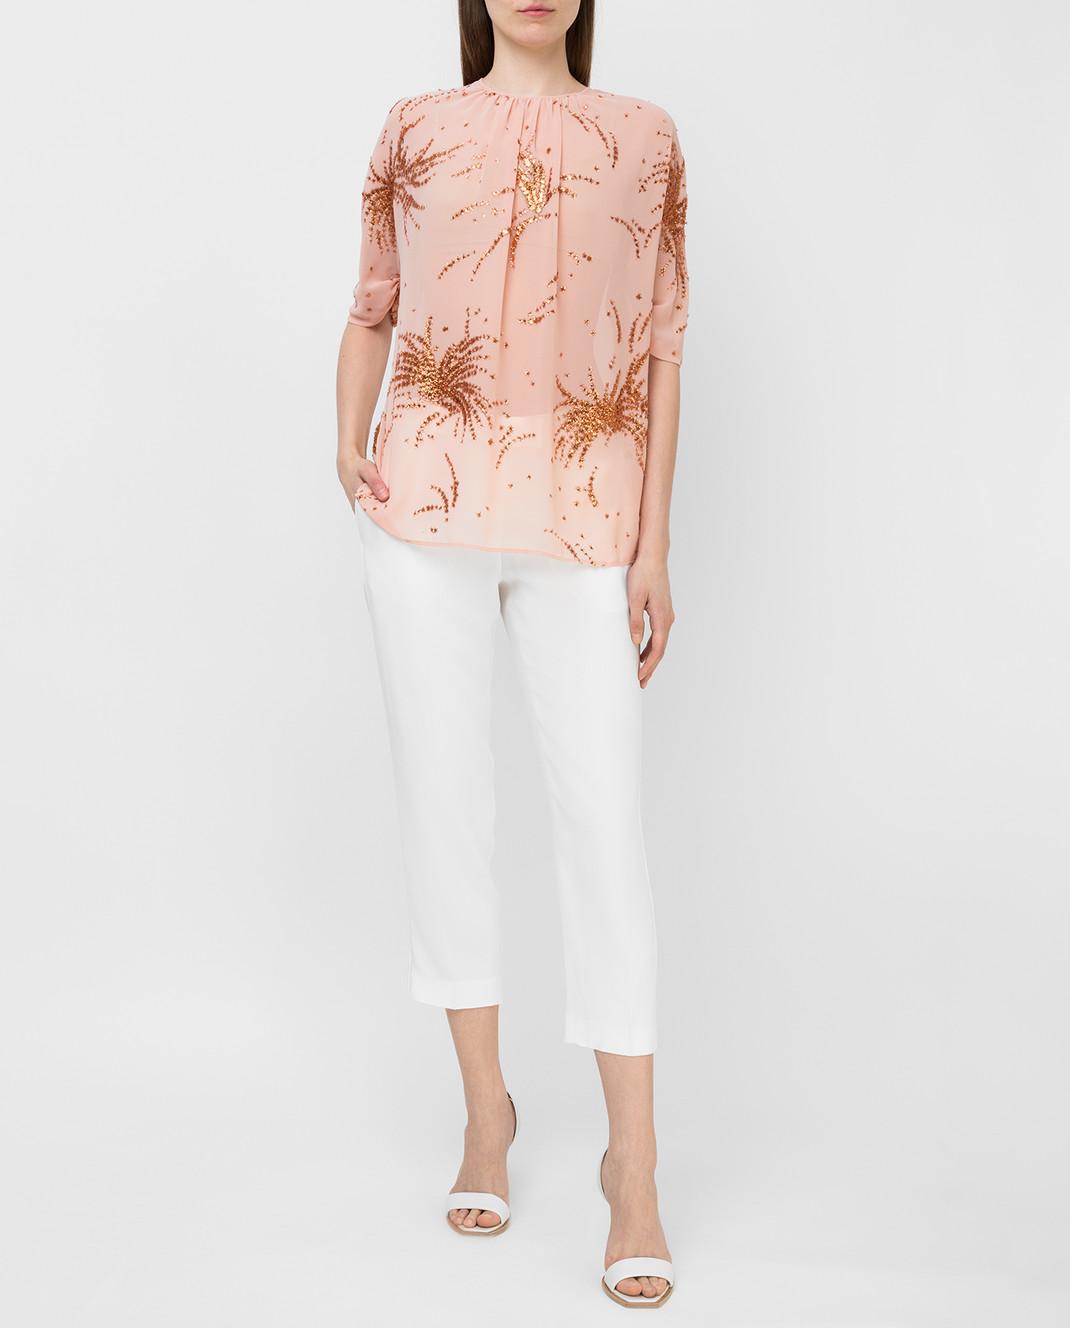 Miu Miu Пудровая блуза MT1296 изображение 2